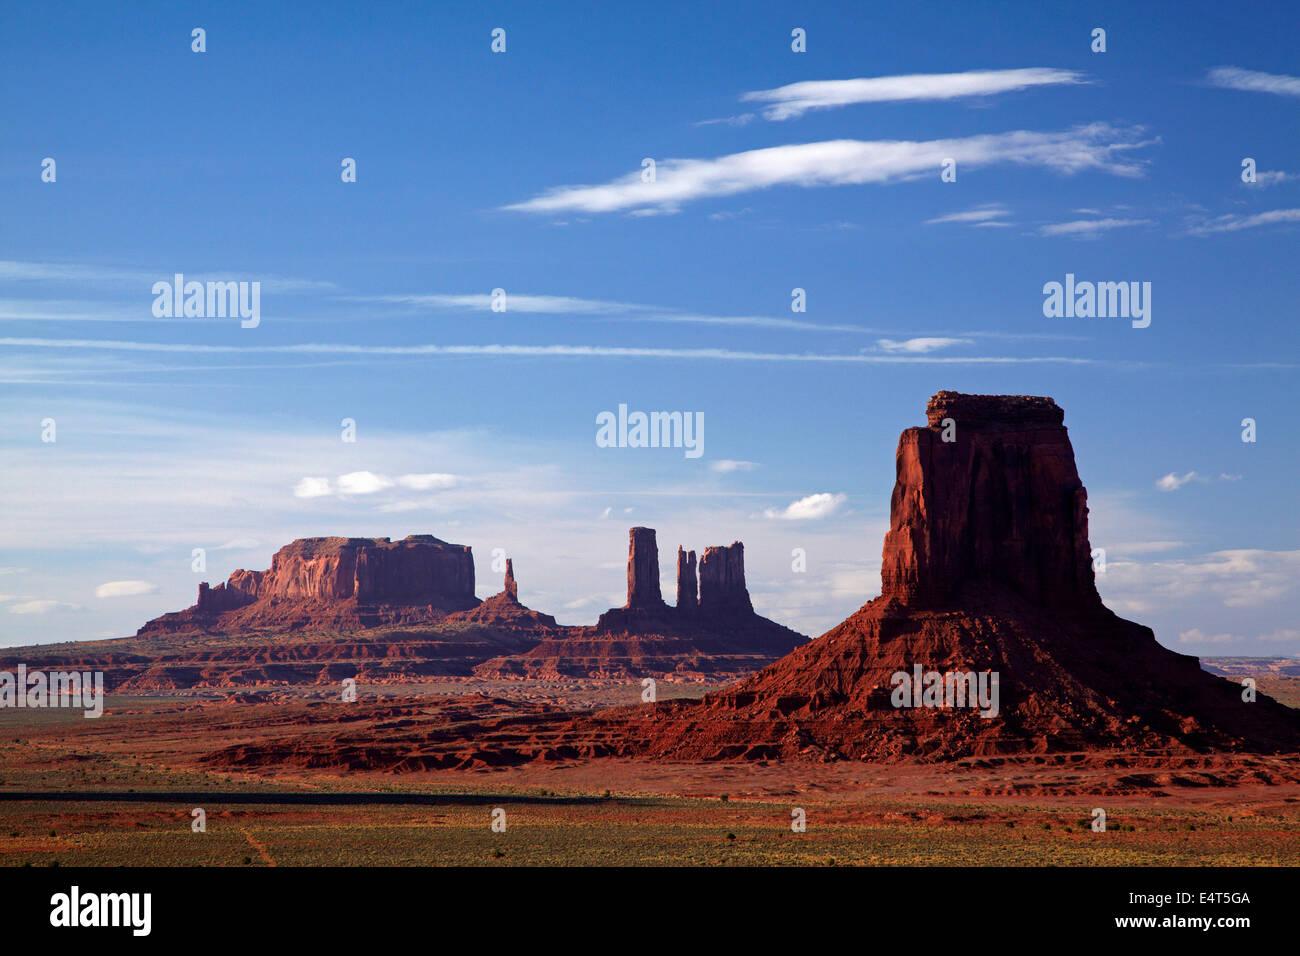 View from Artists Point, Monument Valley, Navajo Nation, Utah/Arizona Border, USA - Stock Image